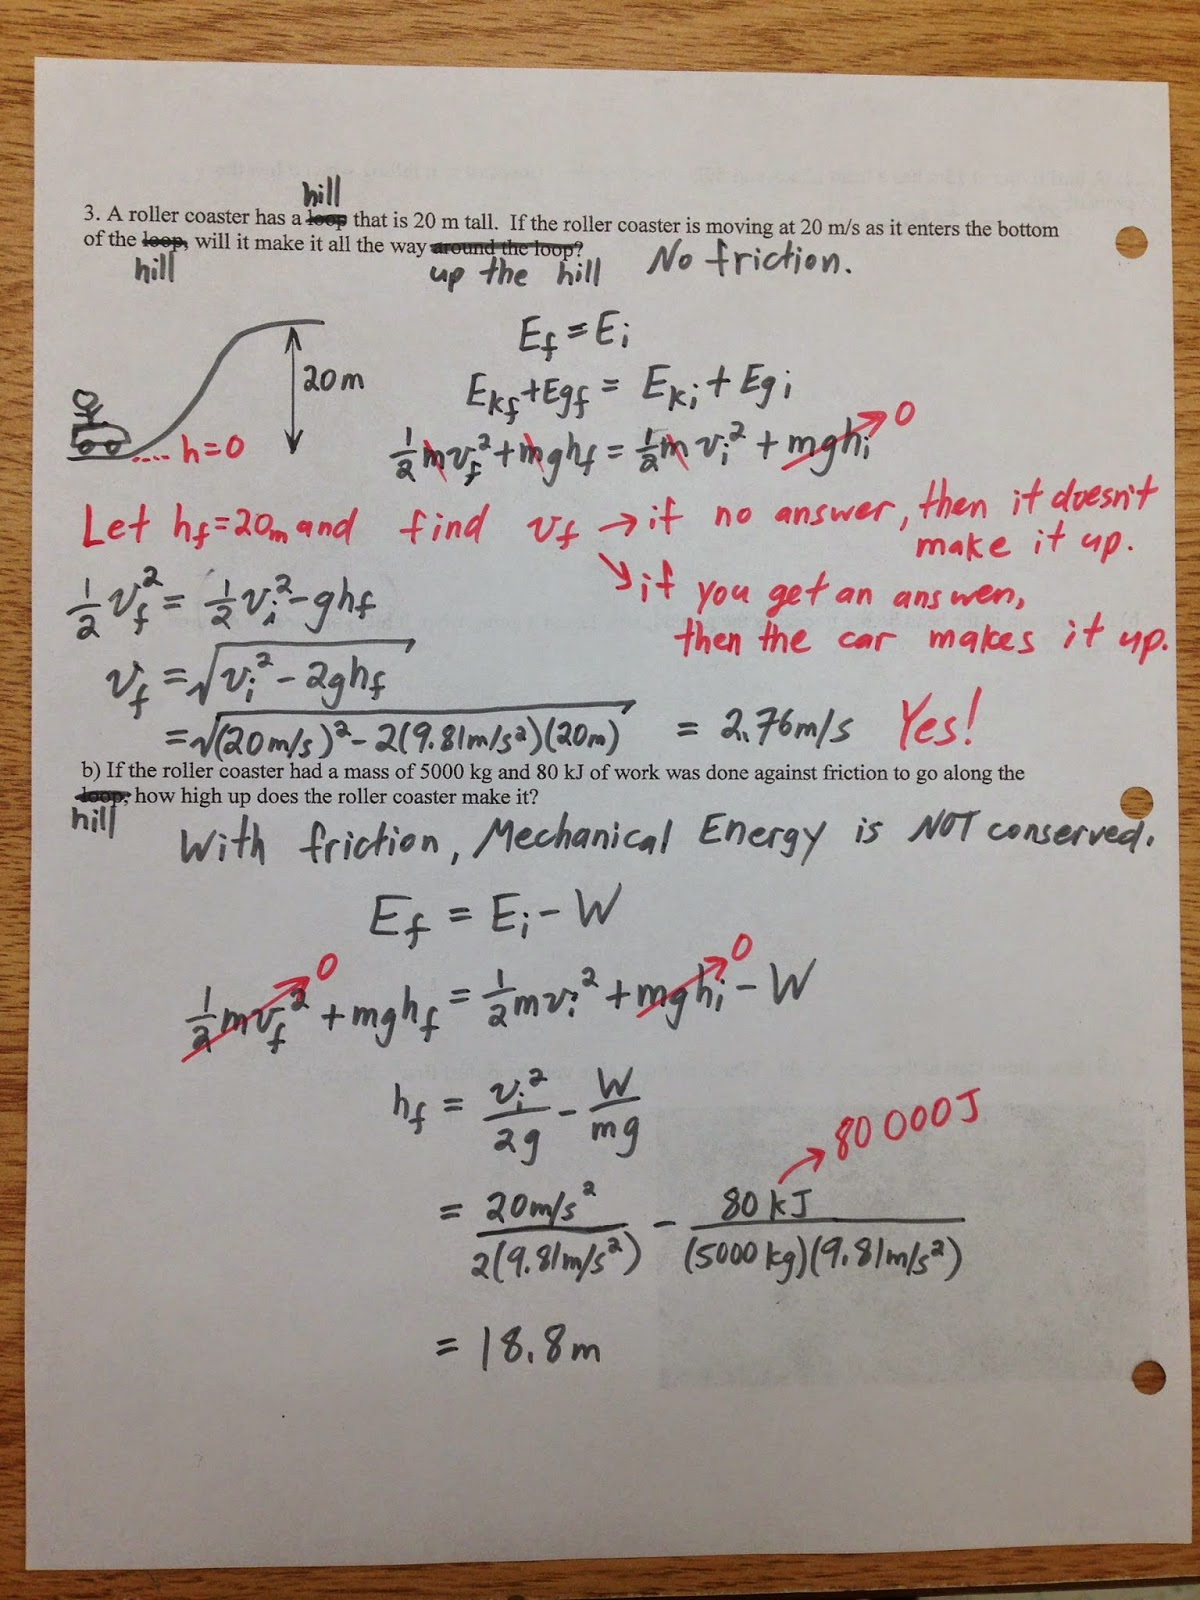 http://indymoves.org/11-grade-physics-worksheets/ [ %2B3%2B07%2B41%2BPM.jpg x 1600 Pixel ]